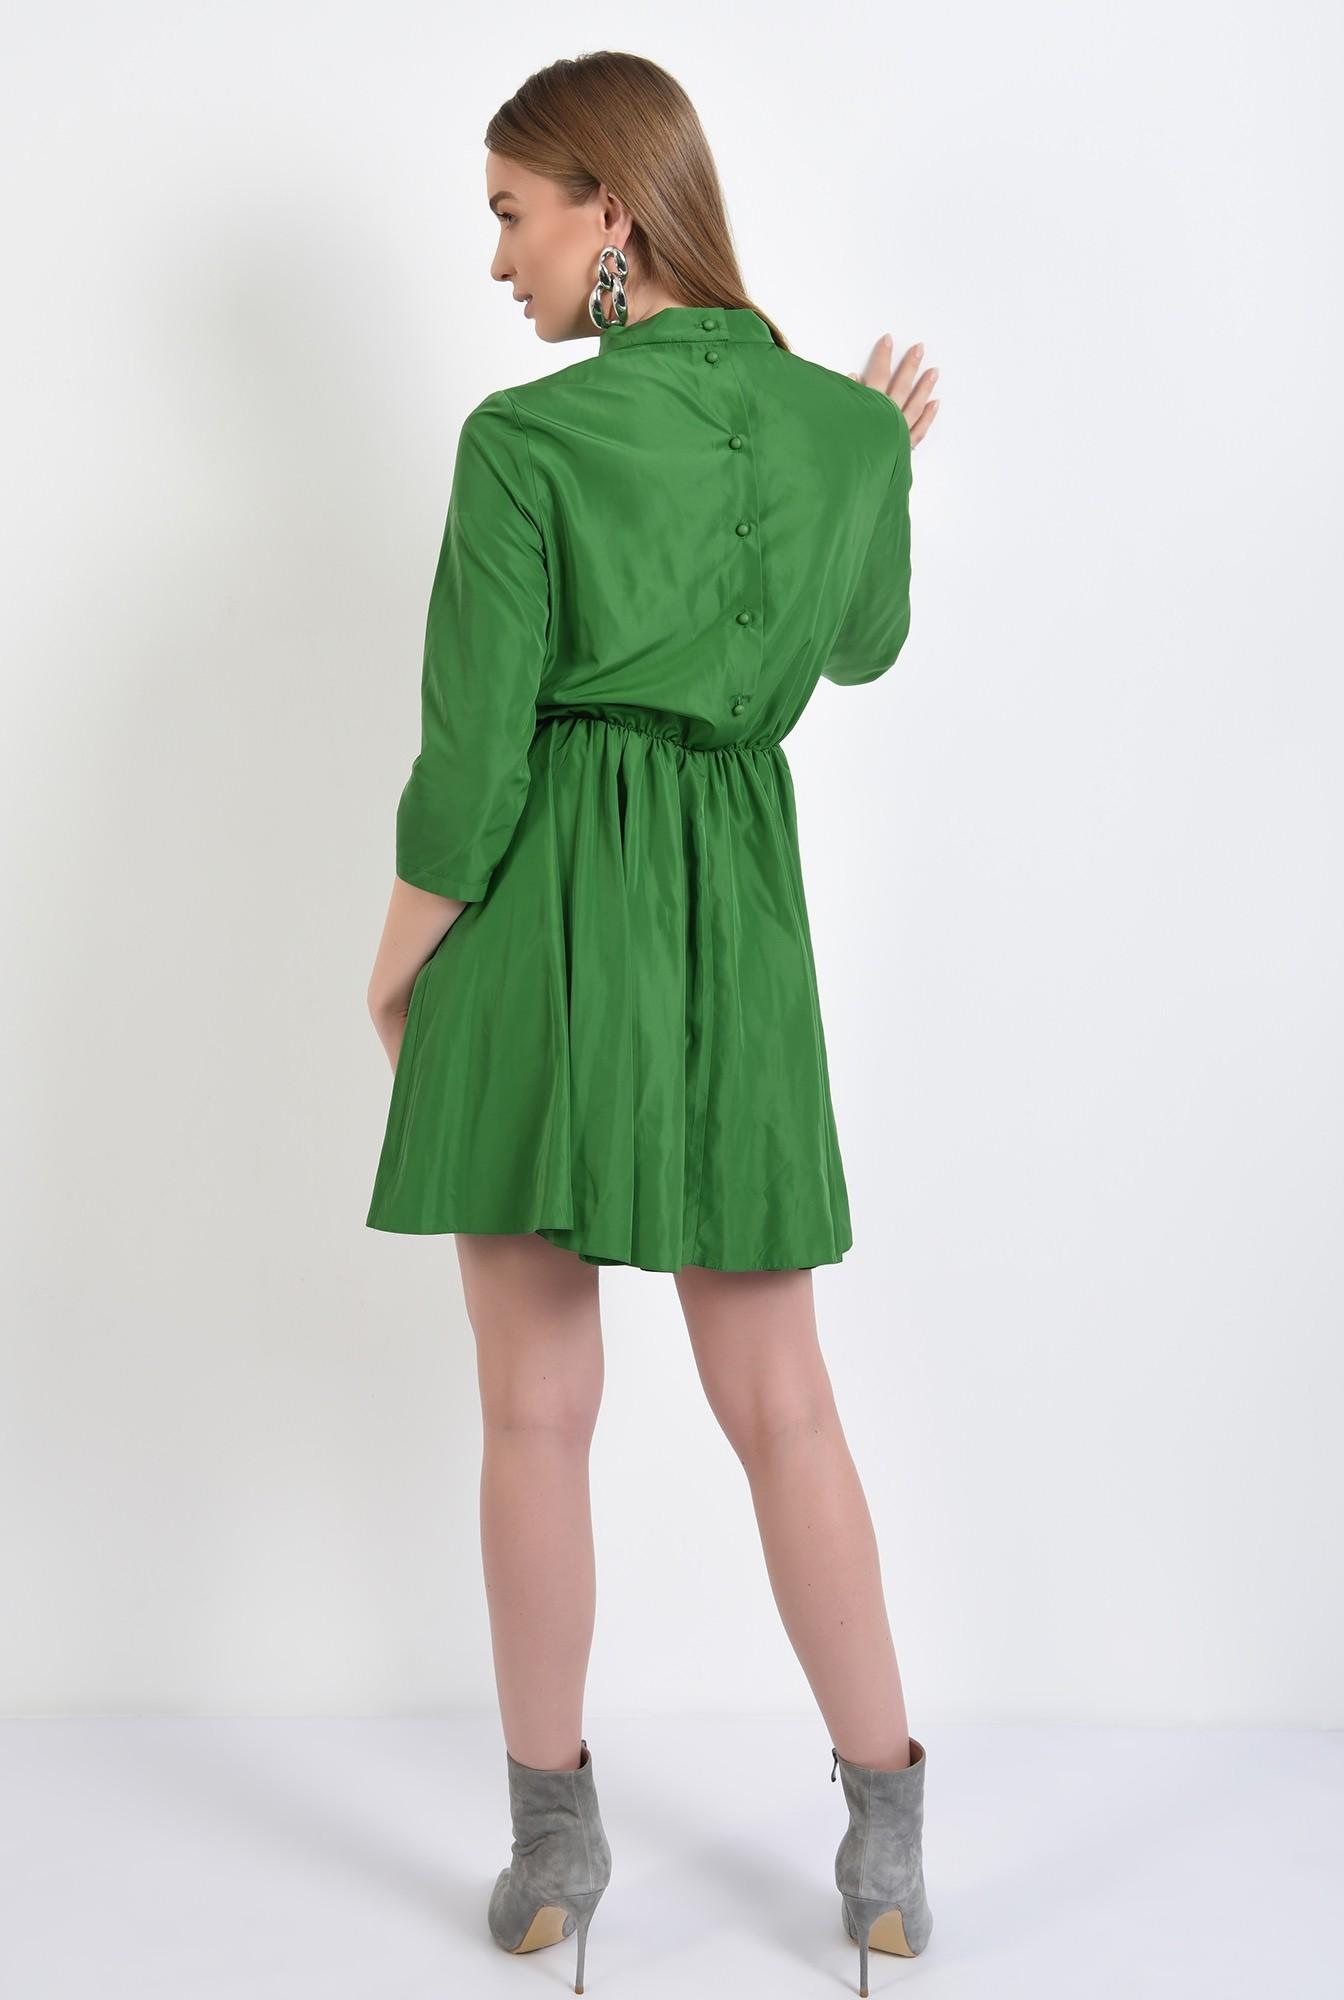 1 -  rochie mini, clos, maneci midi, guler mic, rochie de primavara, nasturi pe spate